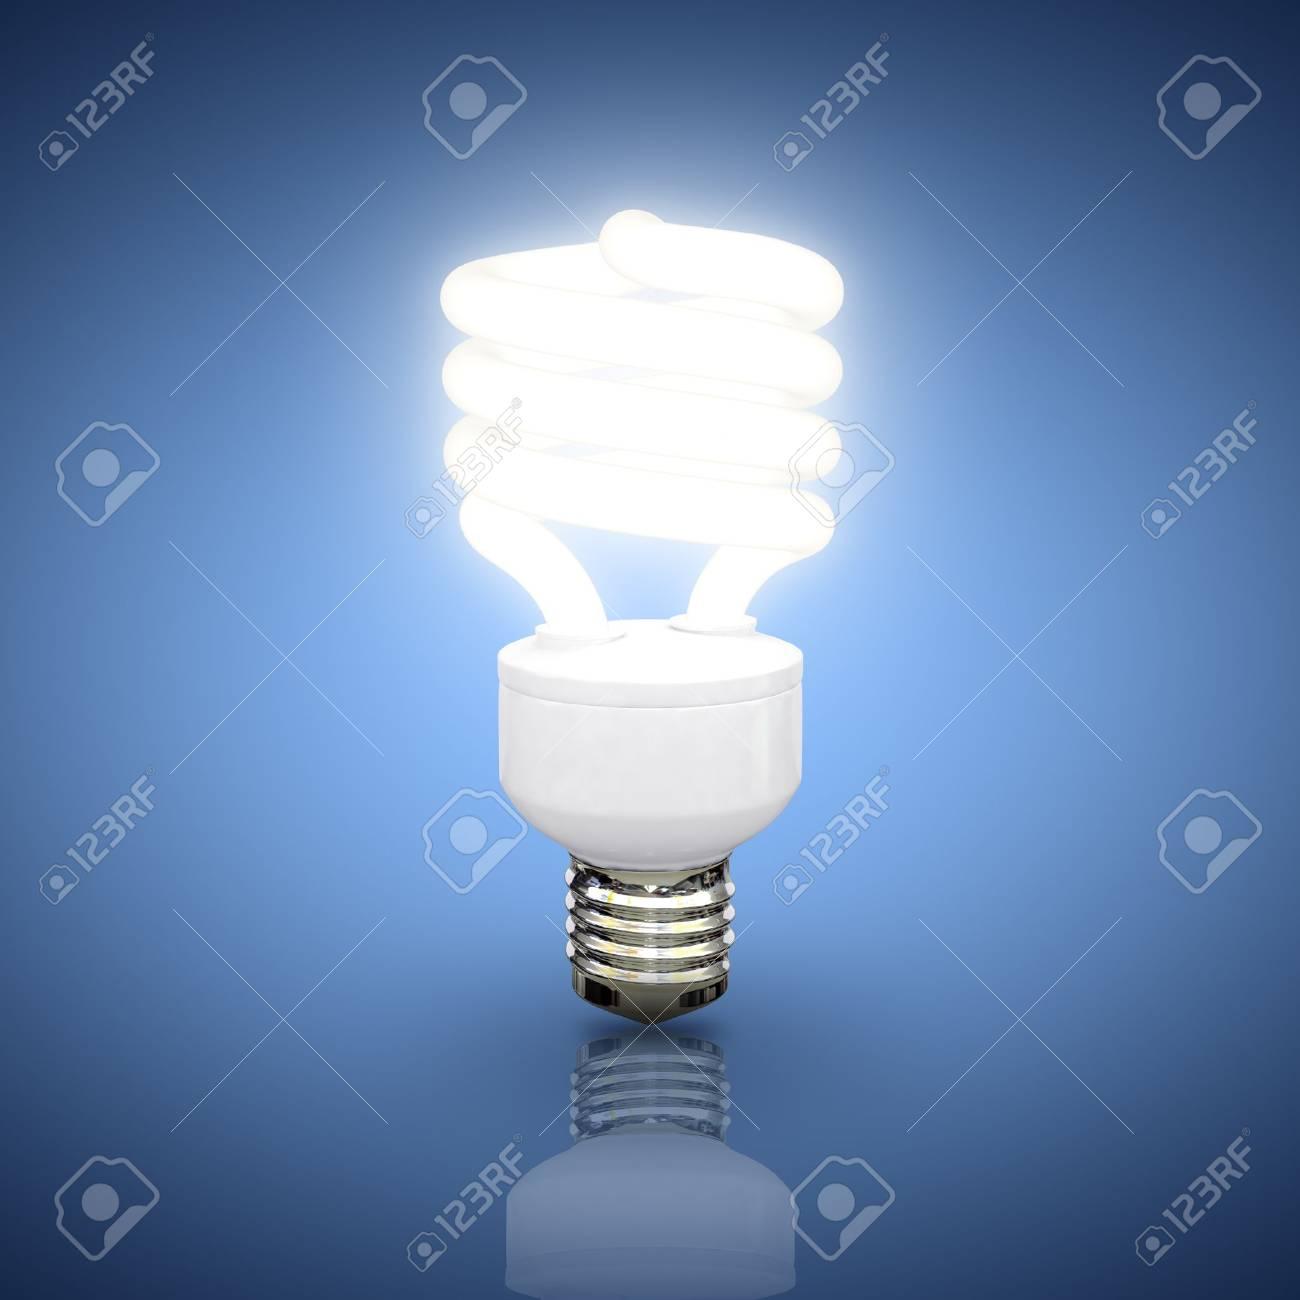 Energy saving fluorescent lightbulb on blue background Stock Photo - 17686597